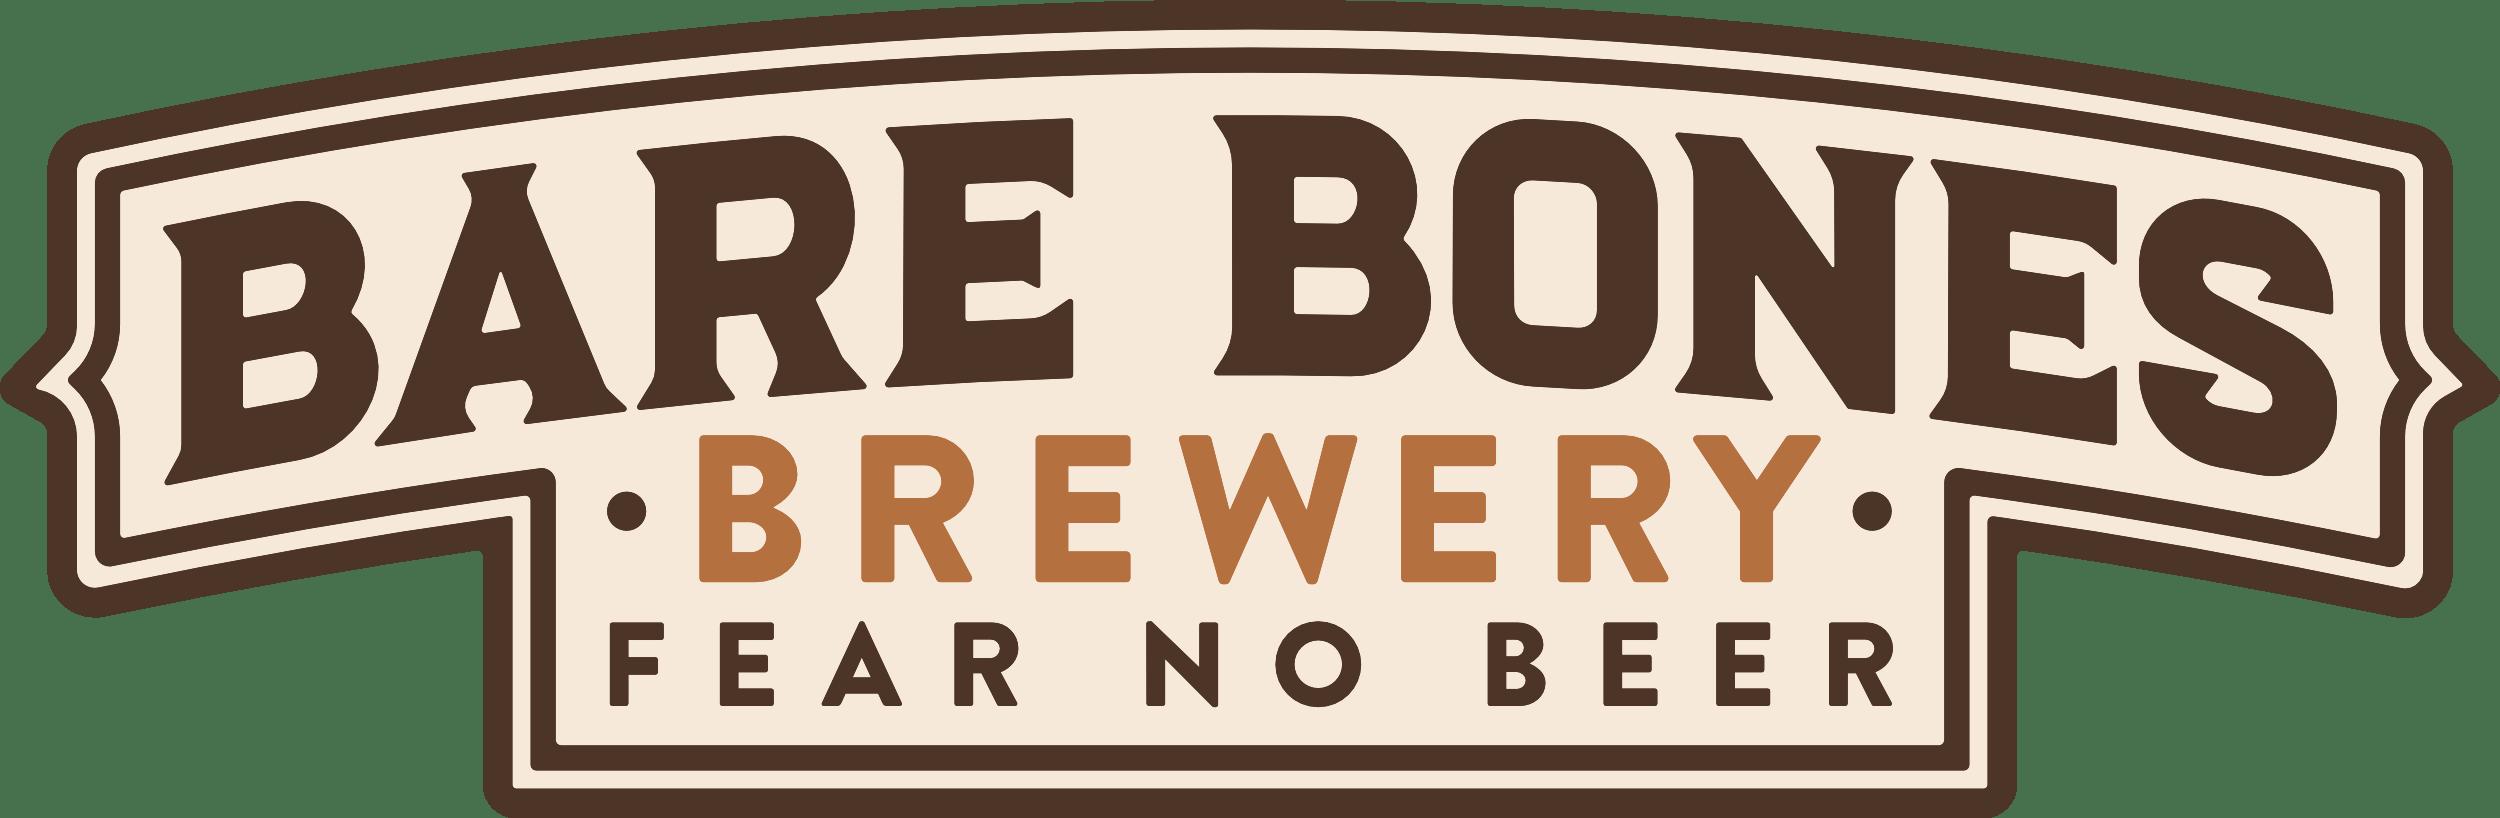 Bare Bones Brewery